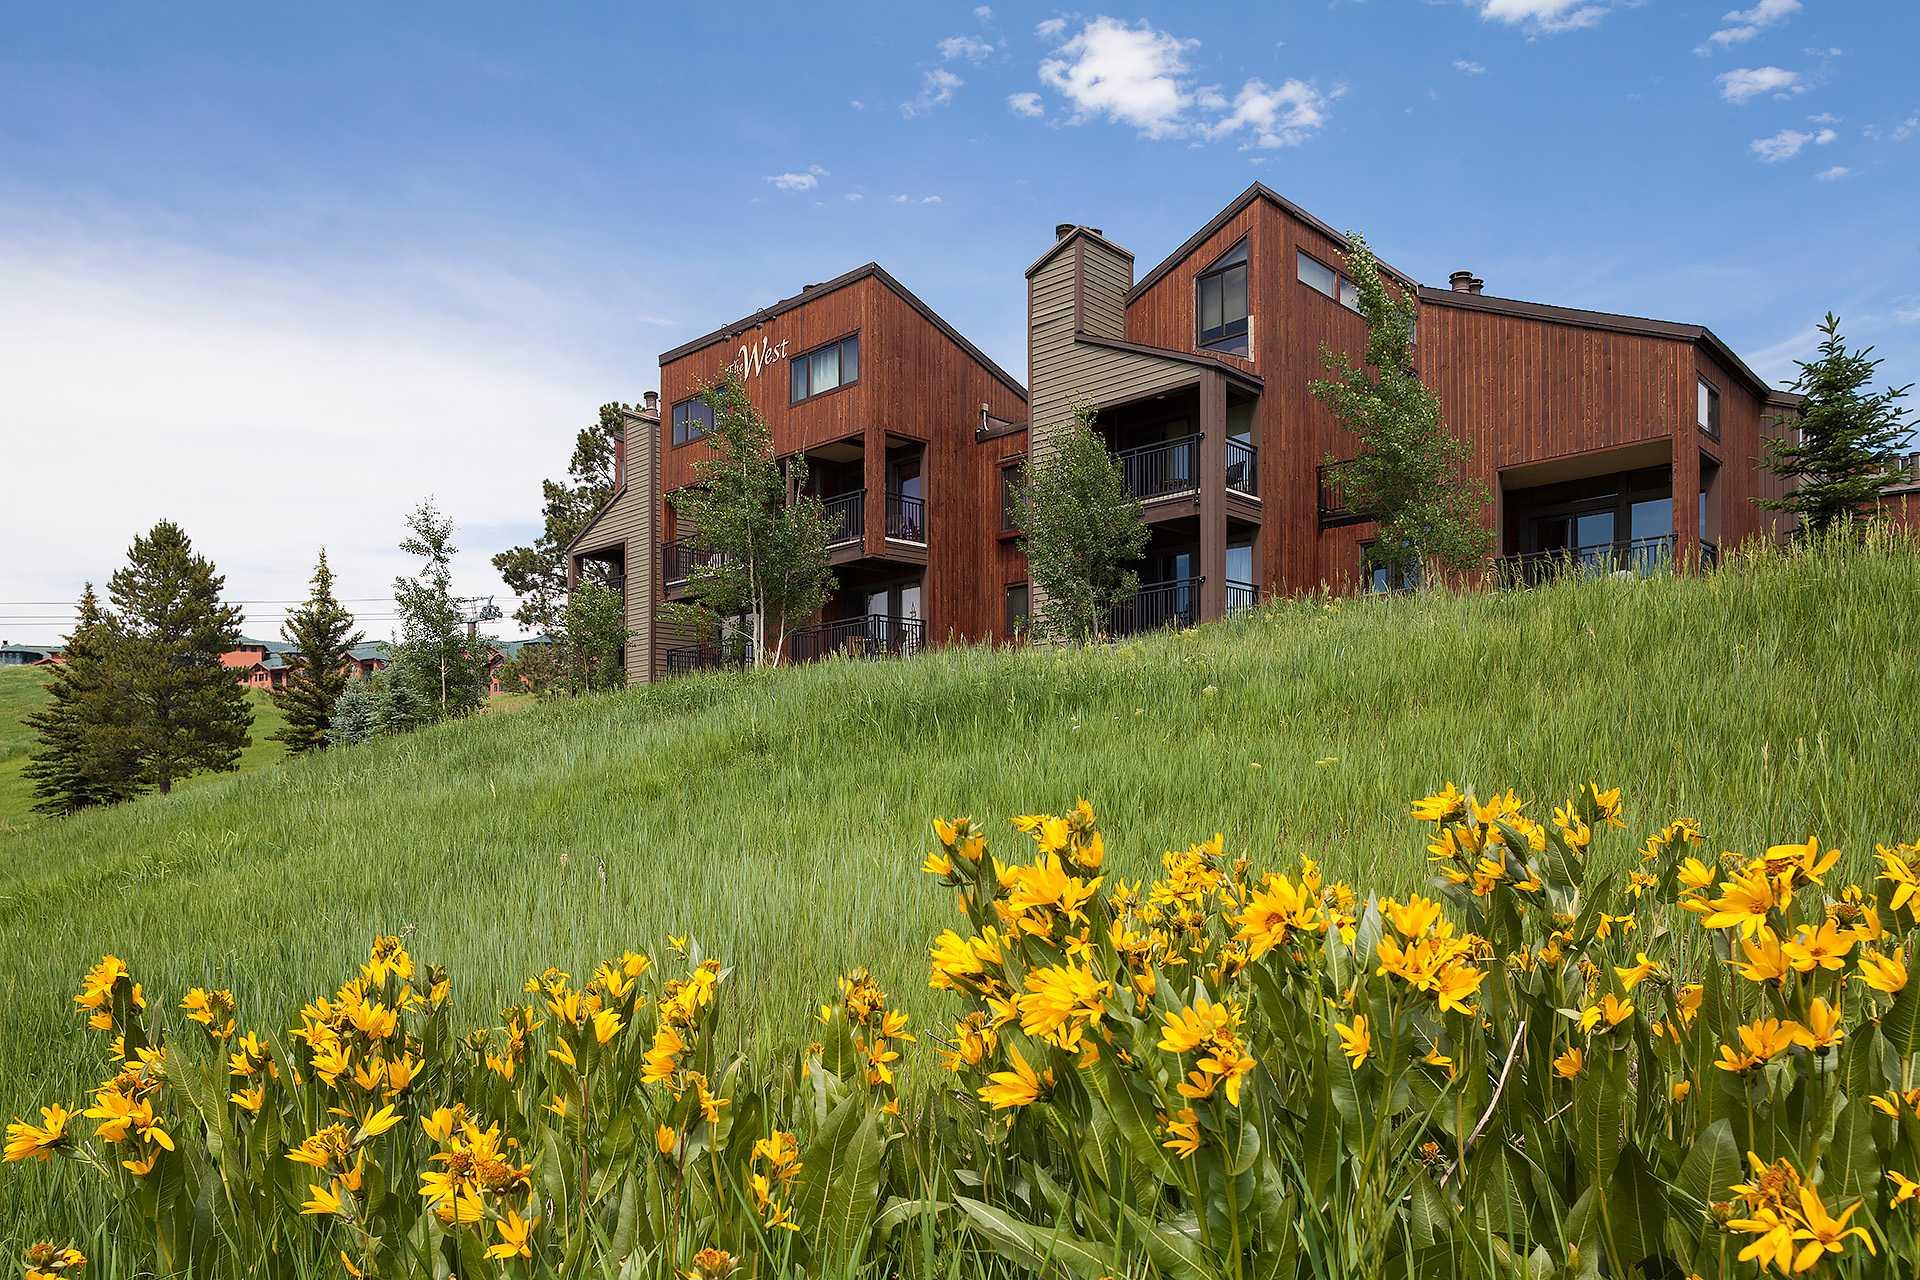 W3401: The West Condominiums